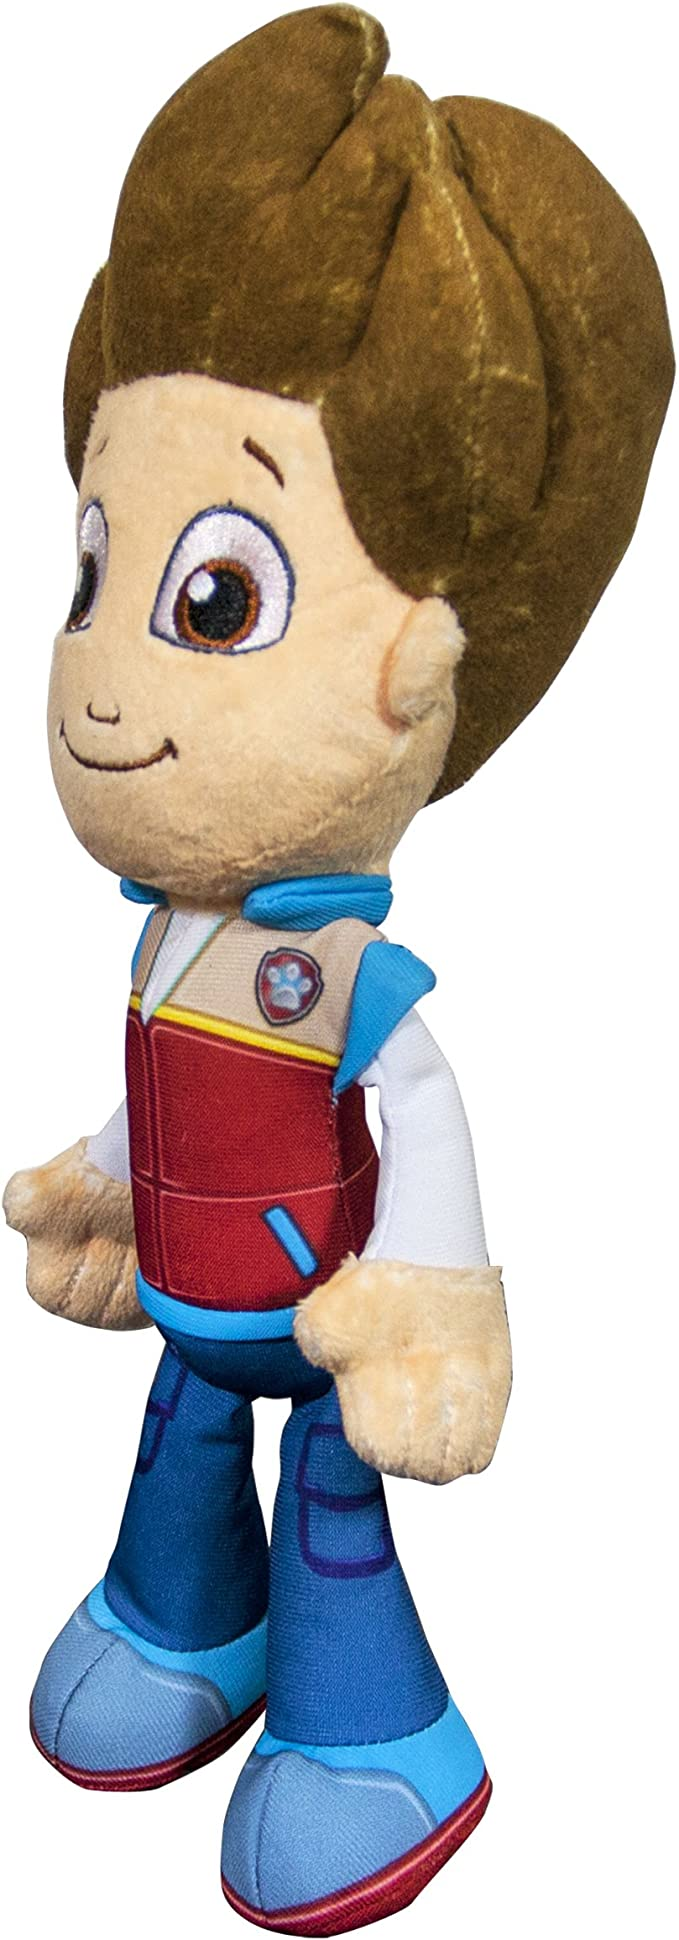 Paw Patrol 20cm Marshall Plush Teddy Pup Pals Soft Cuddle Figure Character Stuff